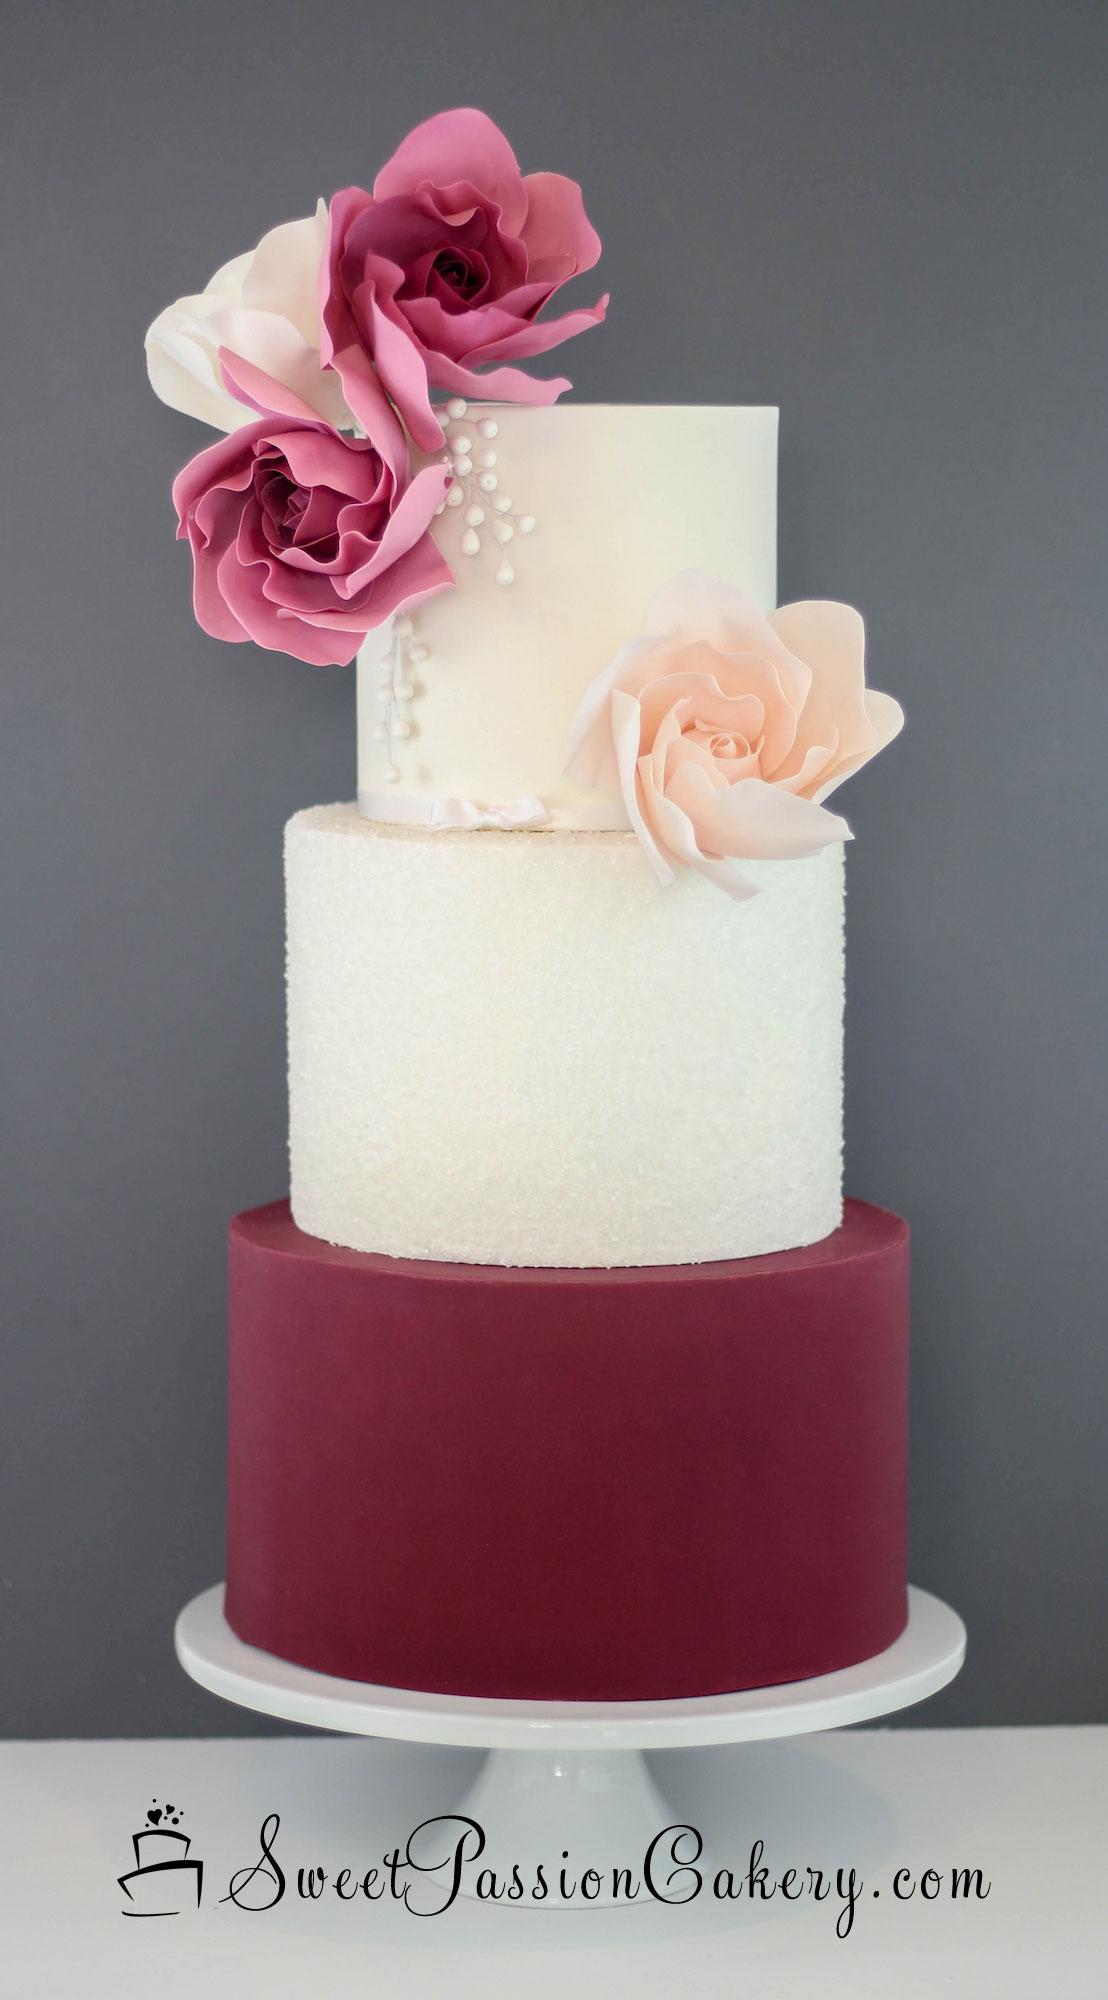 Burgundy & Blush wedding cake